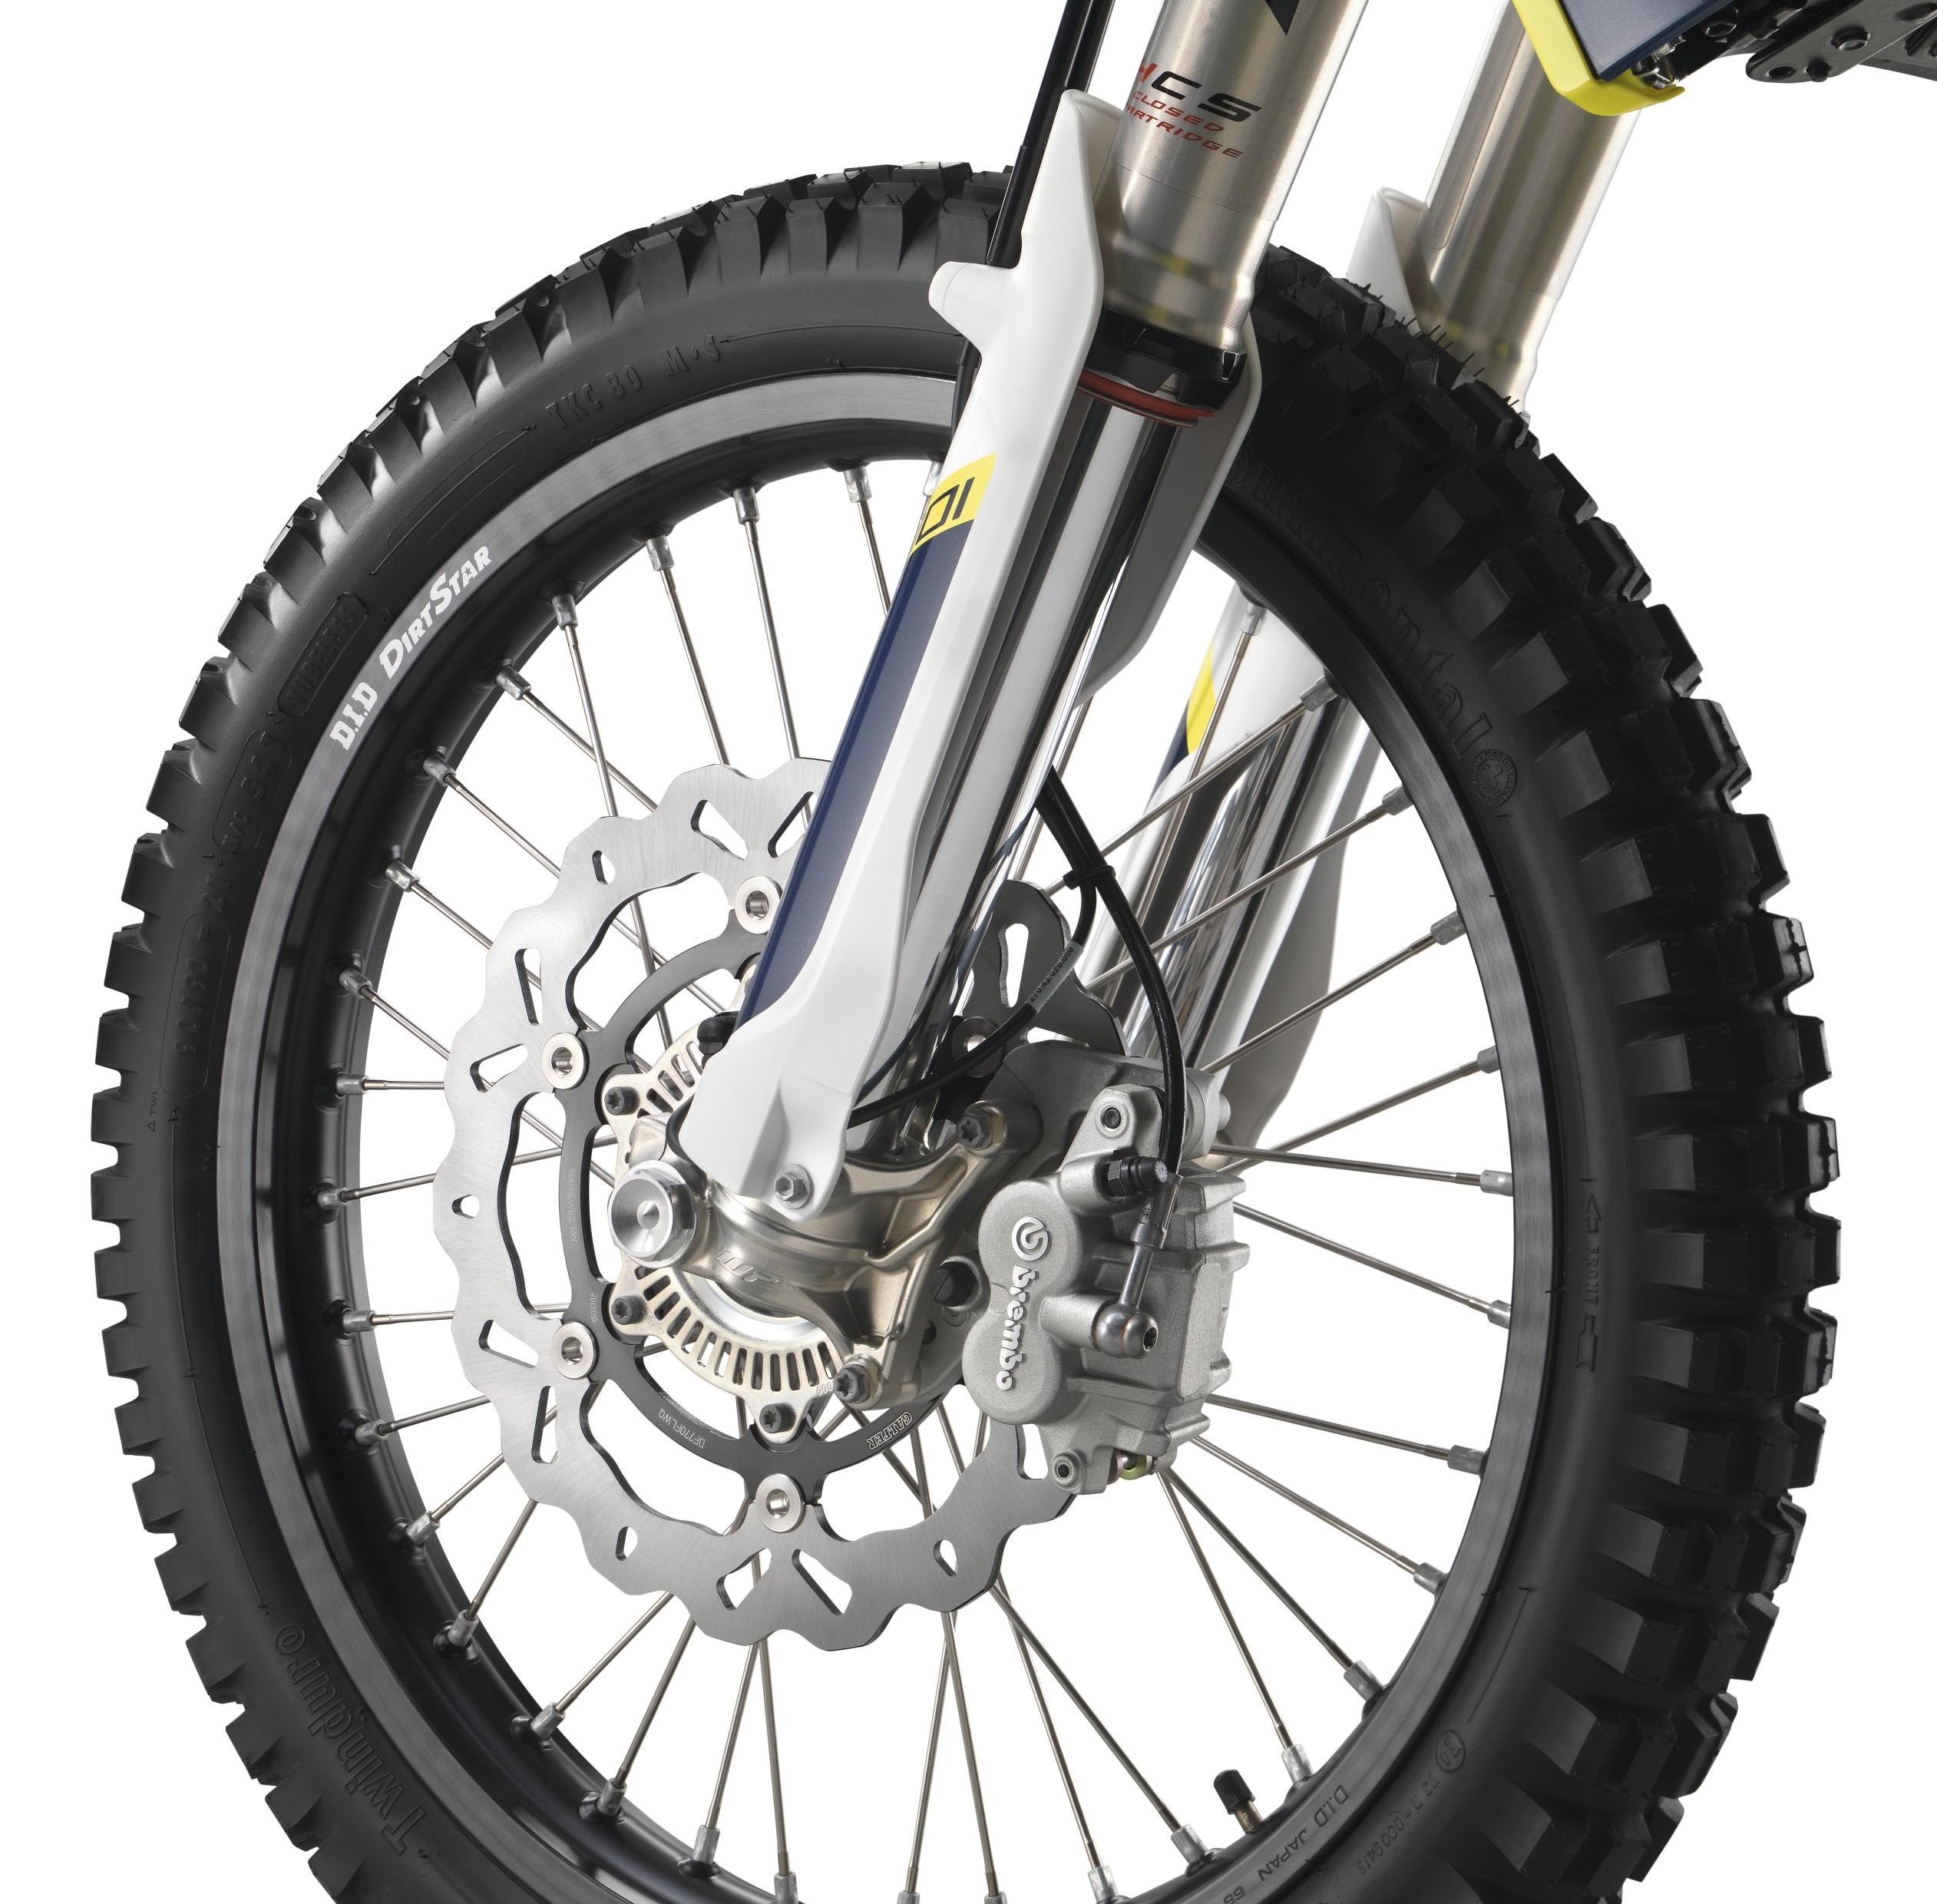 Enduro Release Date >> First ride: Husqvarana 701 Enduro review | Visordown